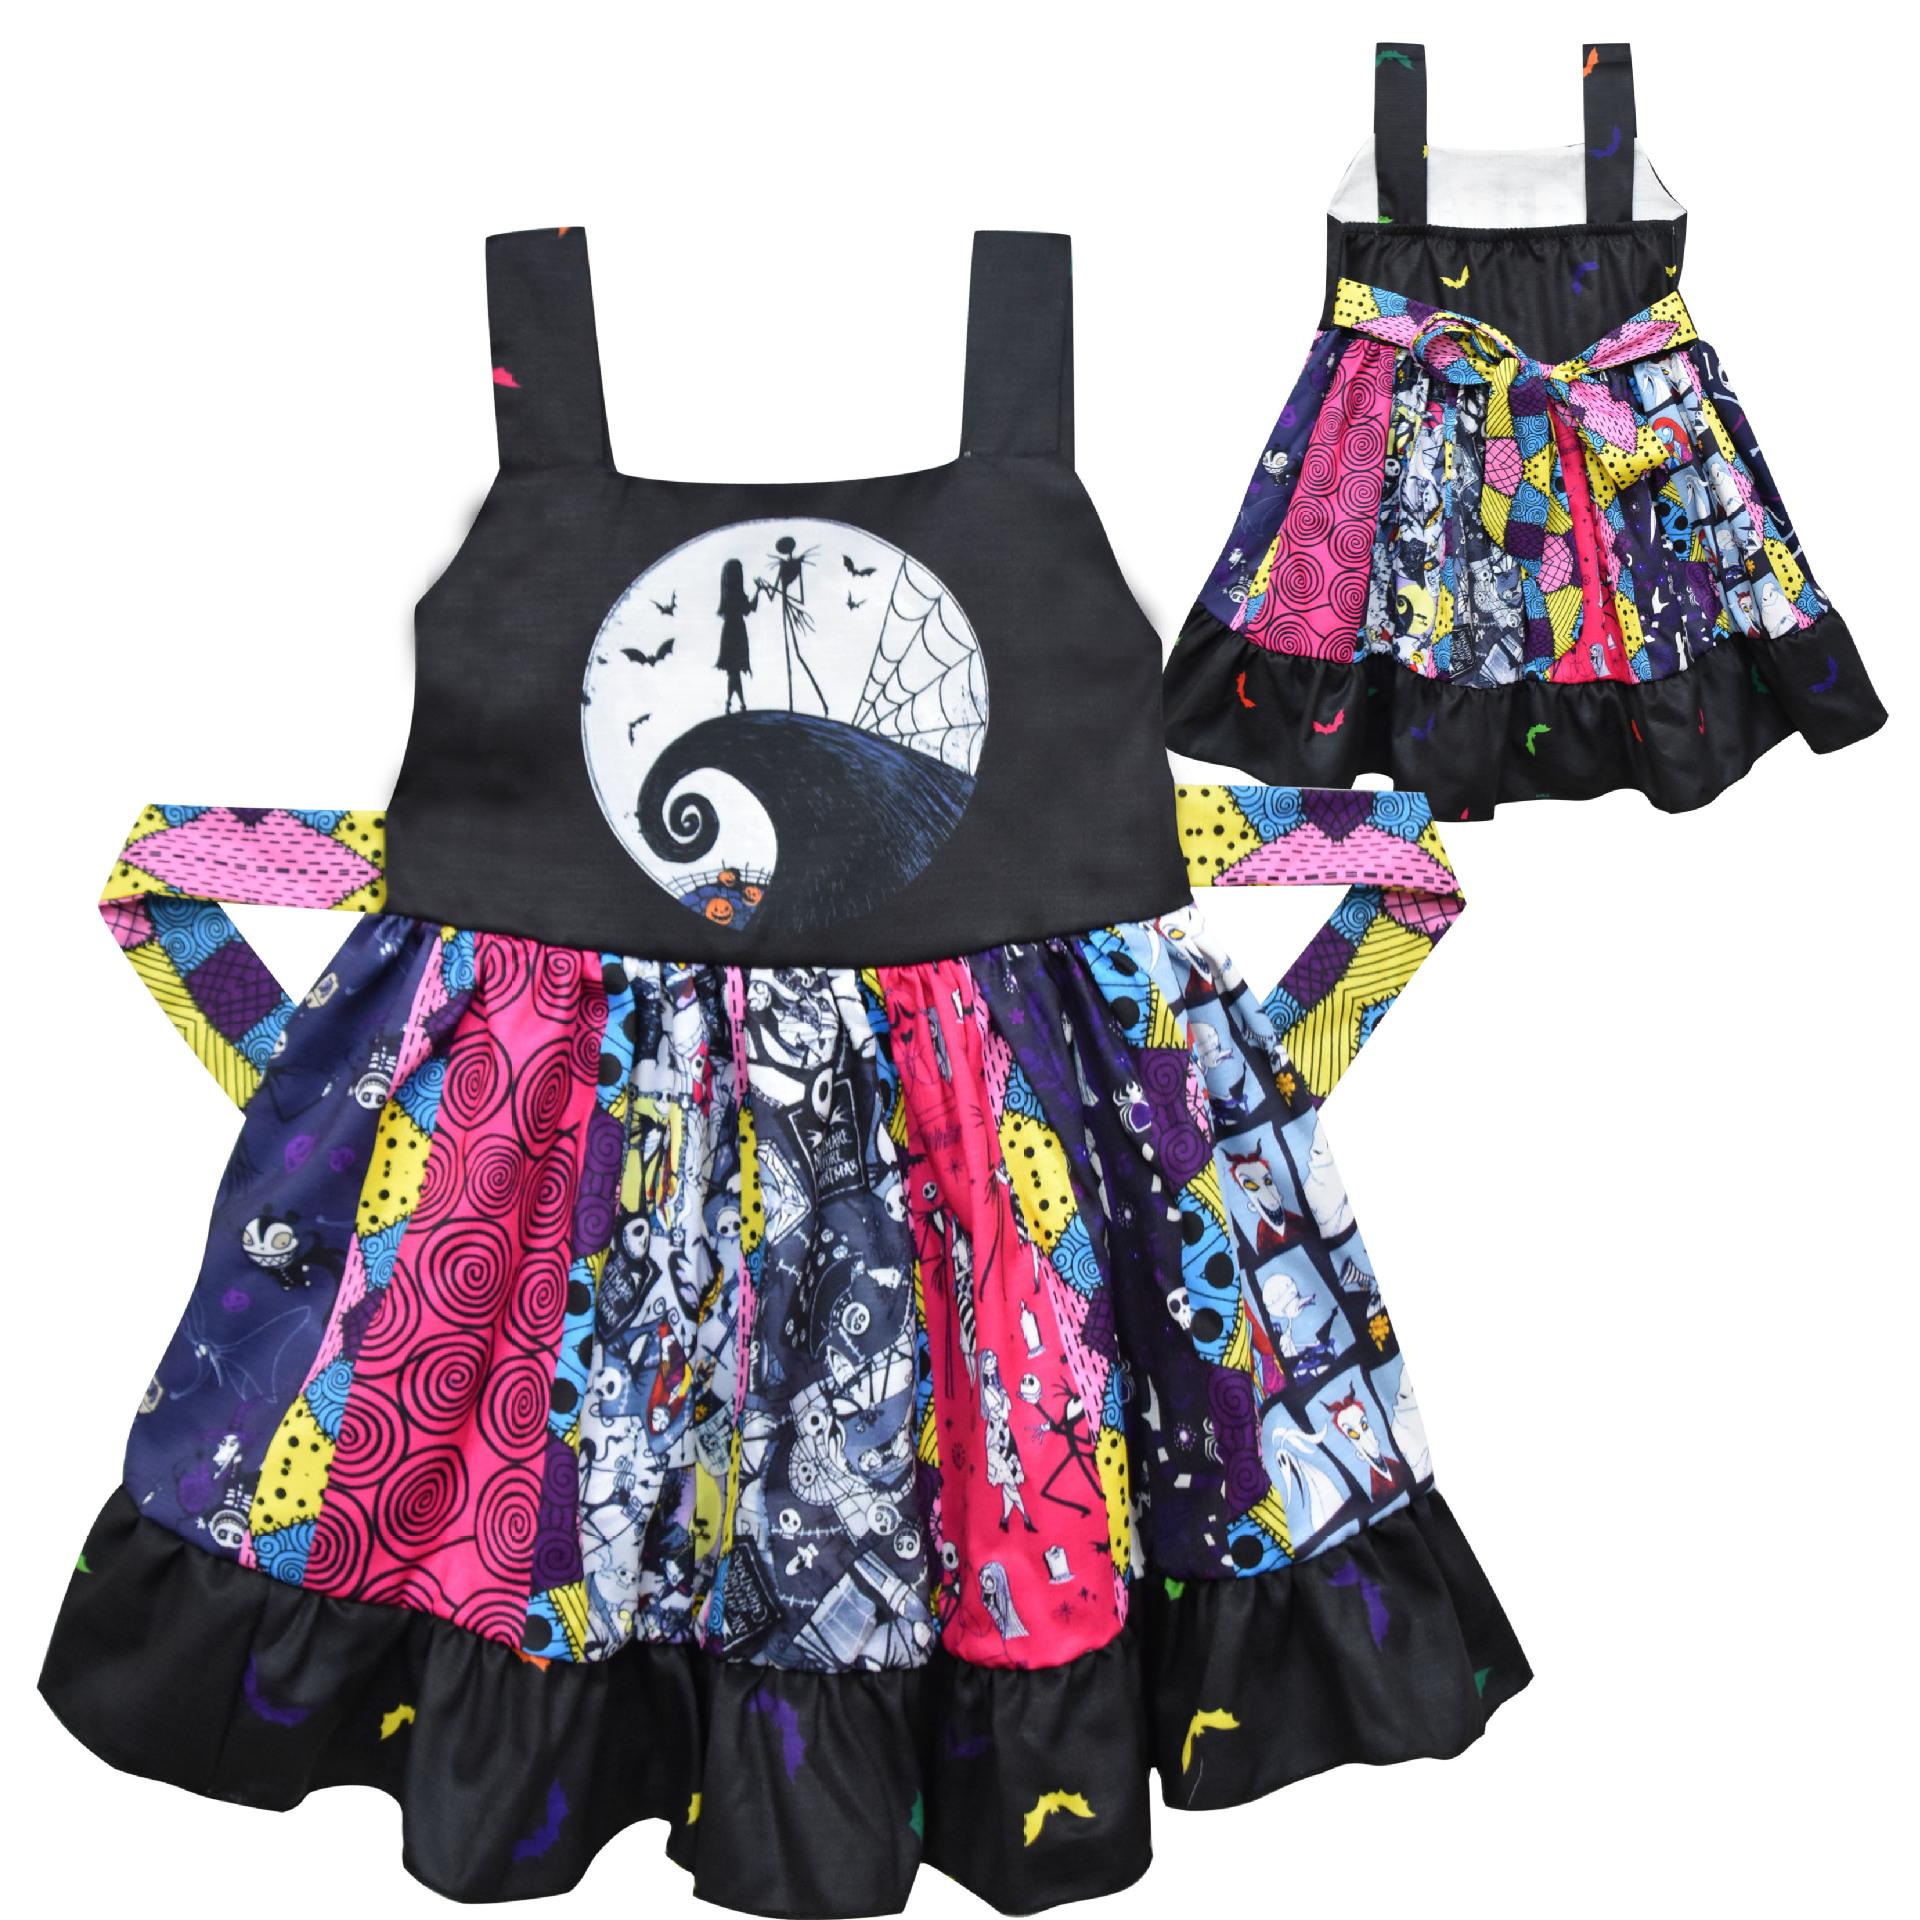 Girls Halloween Cosplay Costume Girls Skeleton 3D Printed Black Halter Sleeveless Dress Kids party surprise dress